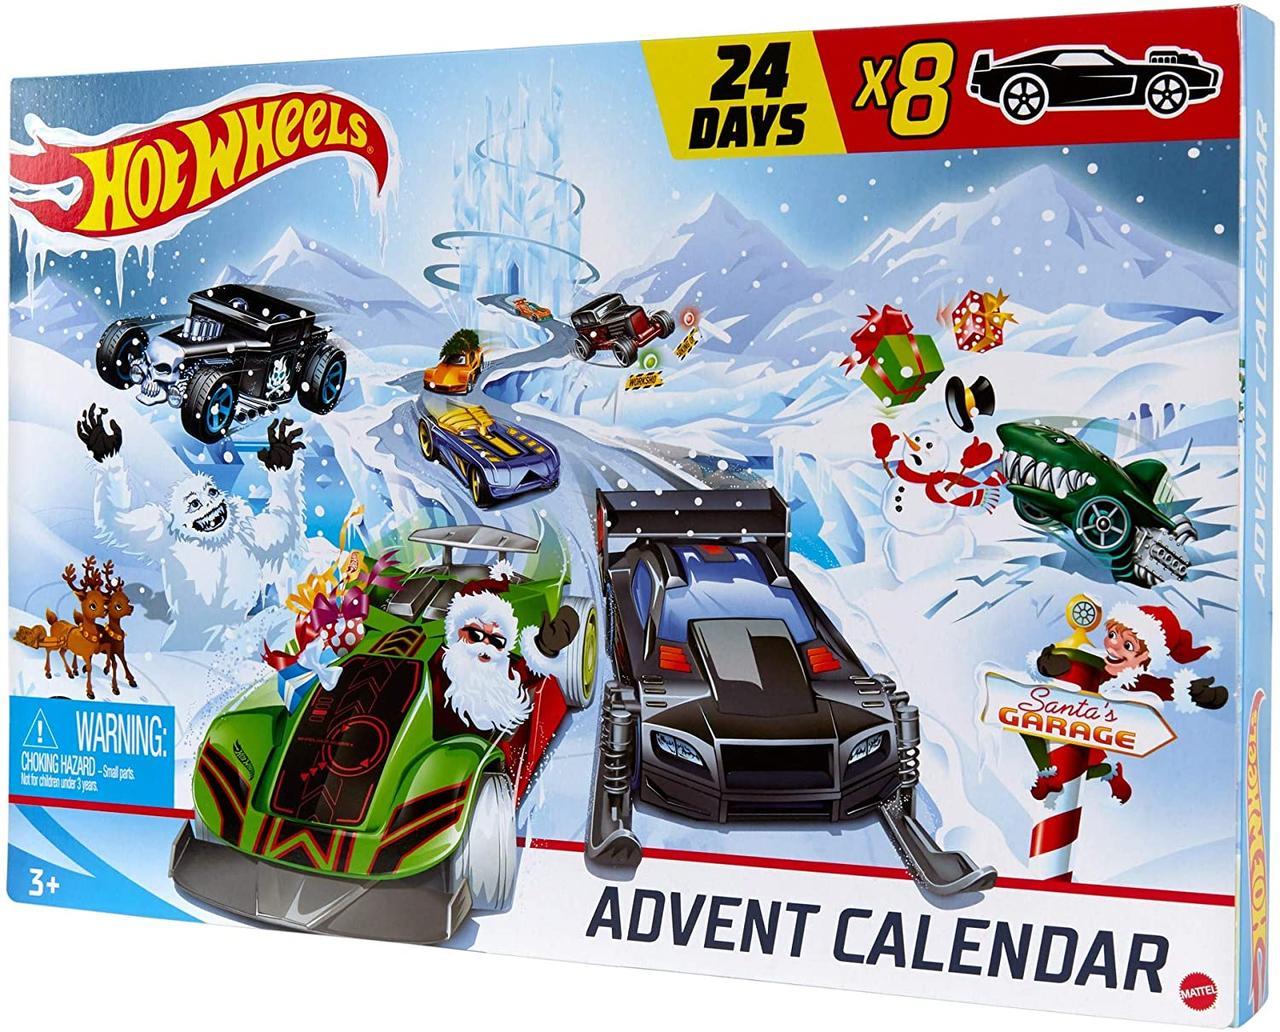 Набор Хот вилс адвент календарь 2020 Hot Wheels Advent Calendar 24 Day Holiday Surprises with Cars оригинал